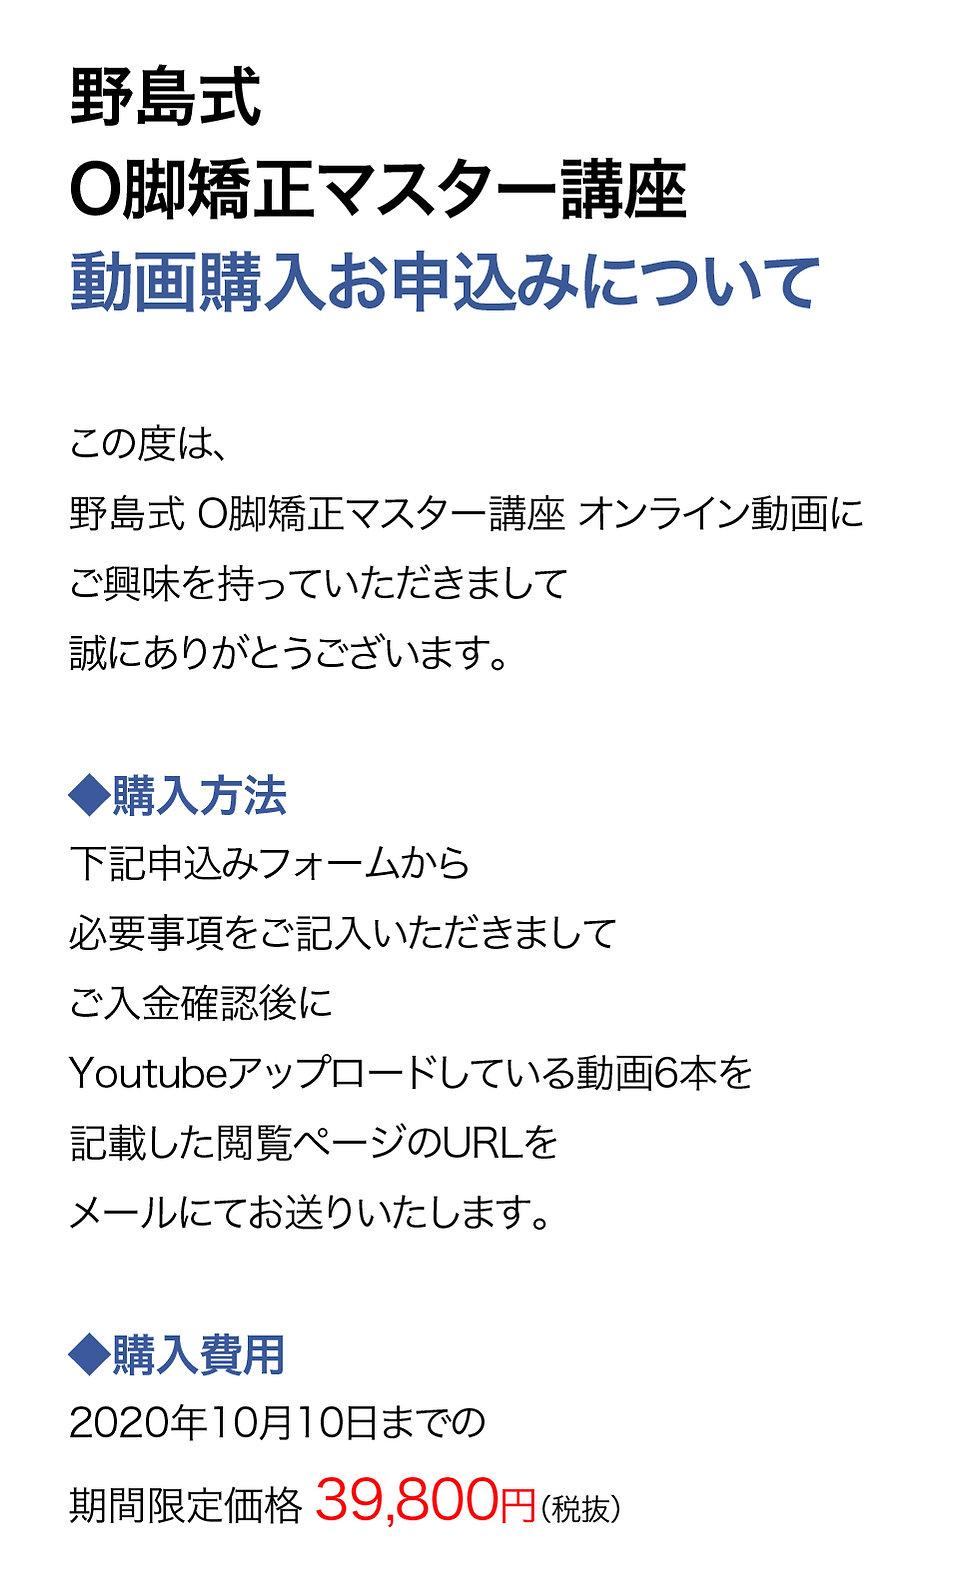 LP_野島式O脚矯正マスター講座_動画購入申込ページ_200416-01.j